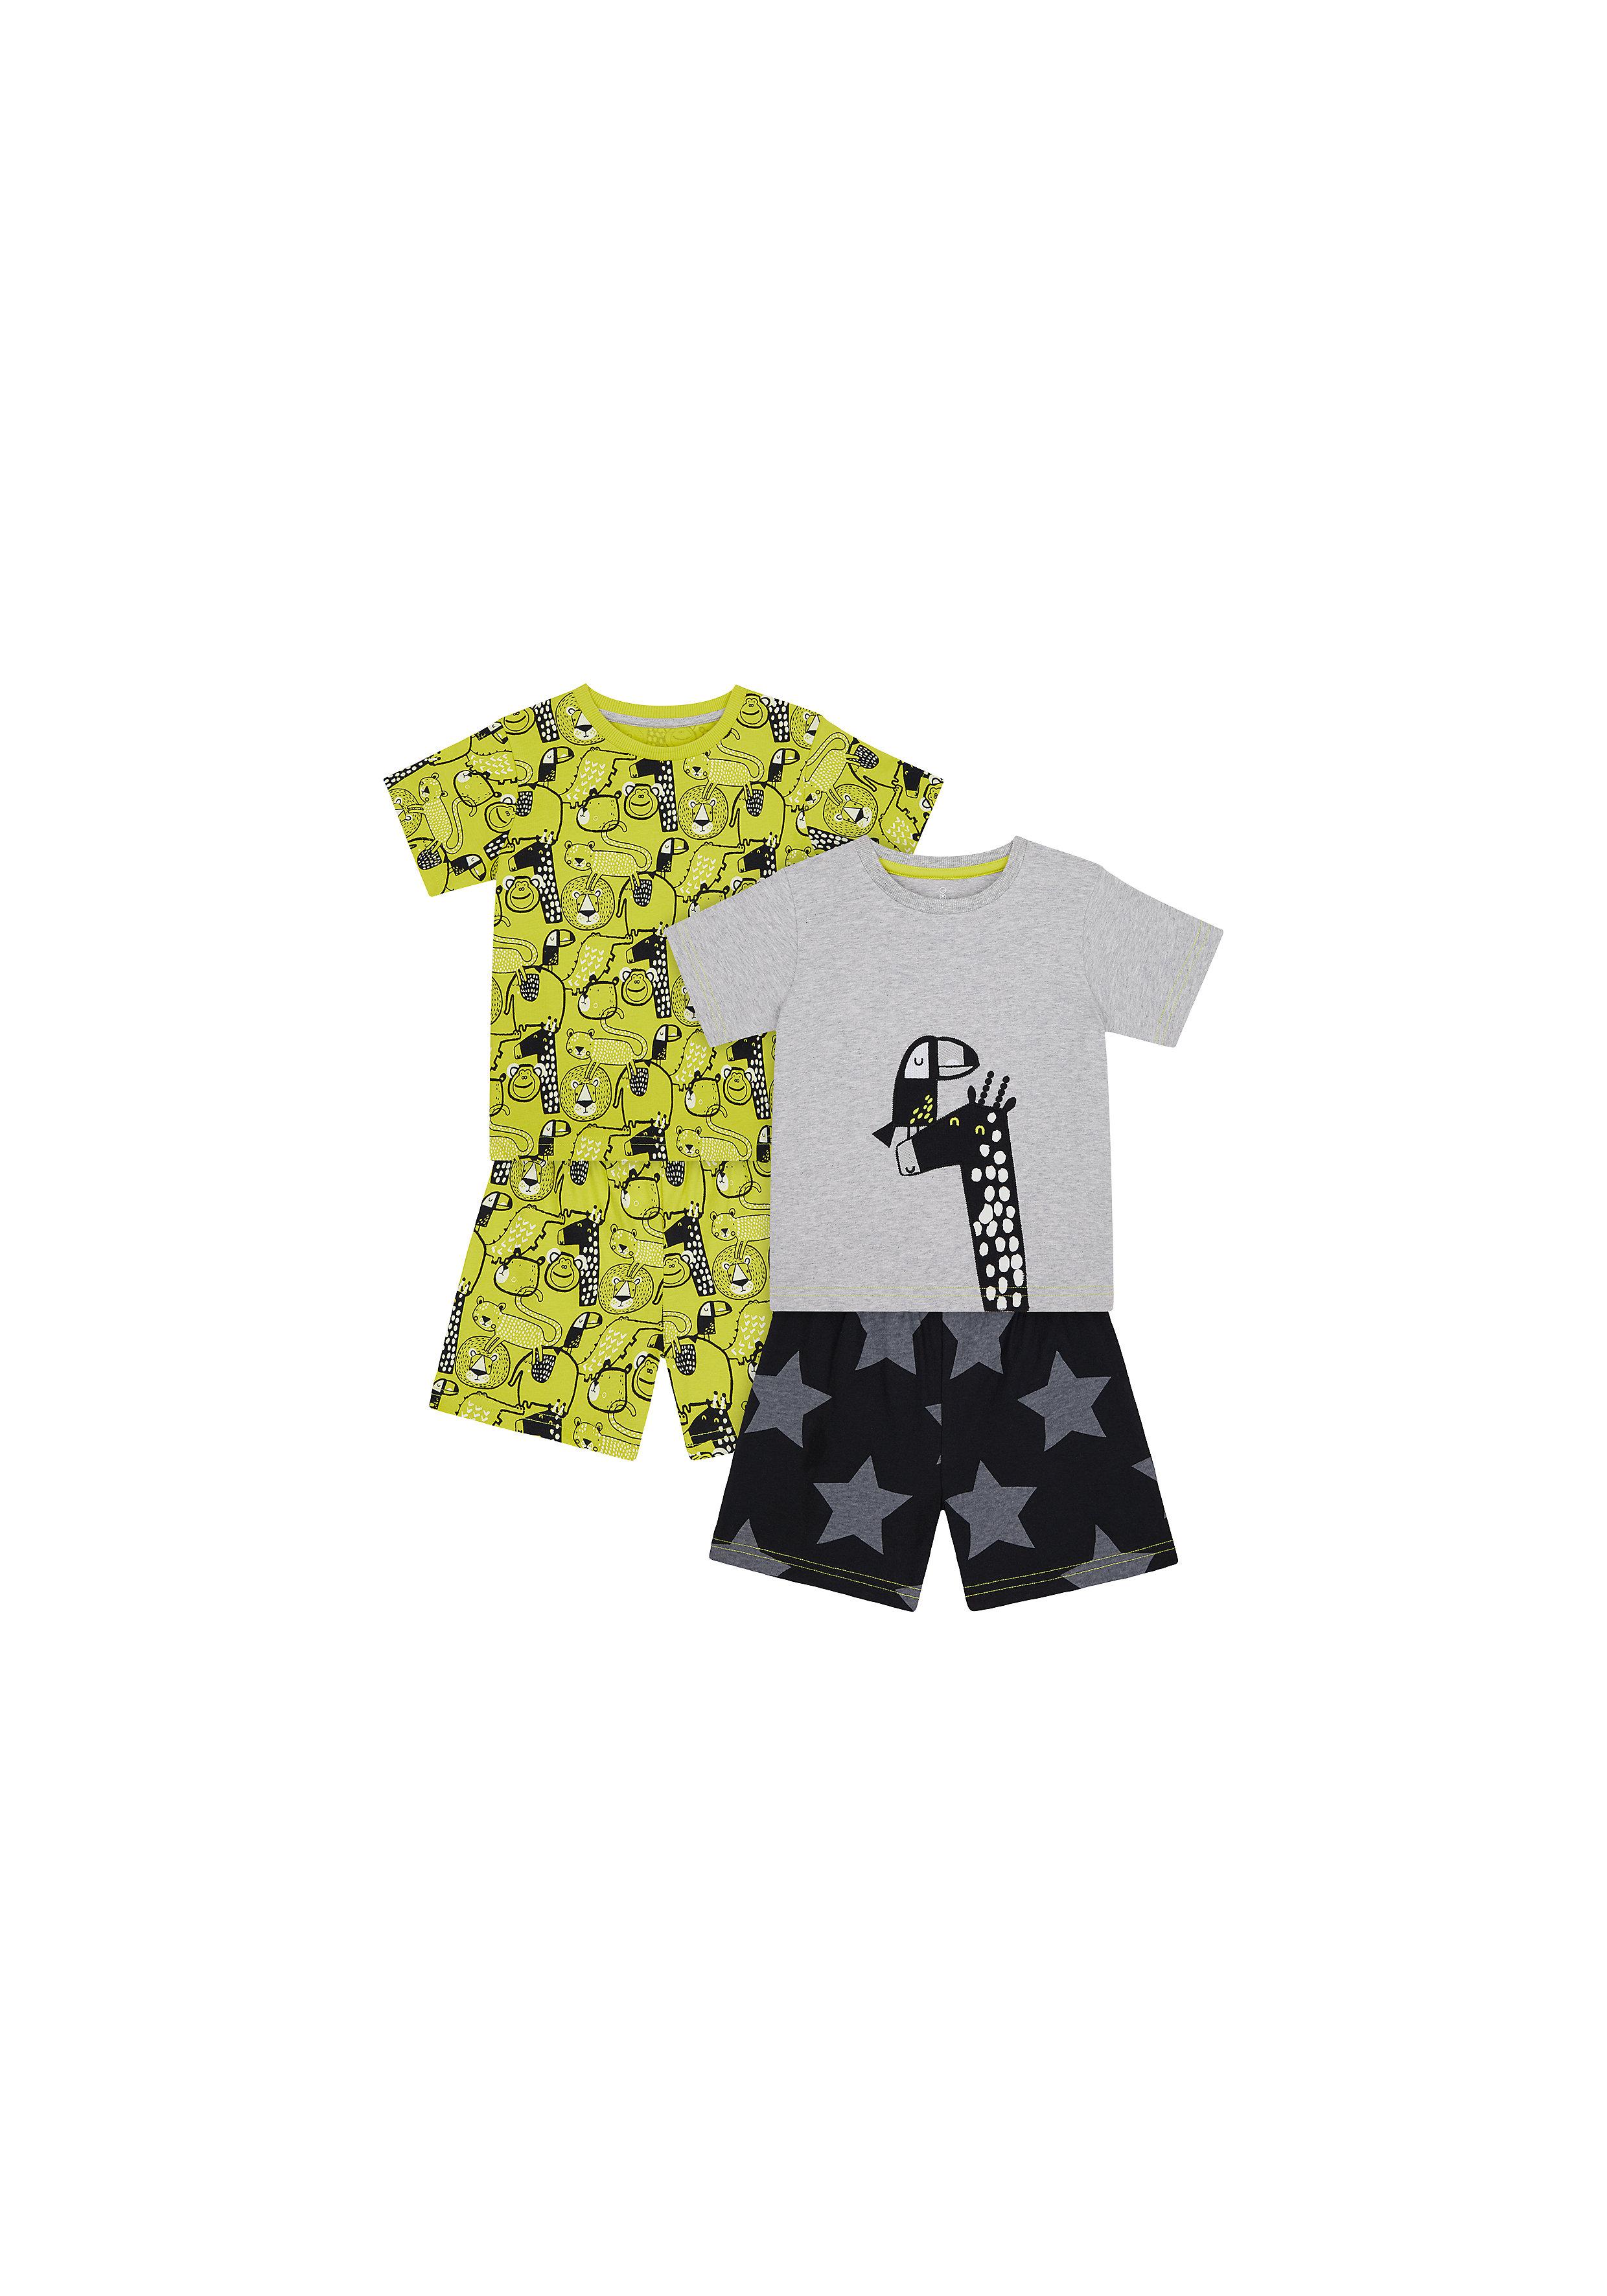 Mothercare | Boys Half Sleeves Shortie Pyjama Set Giraffe Embroidery - Yellow Grey